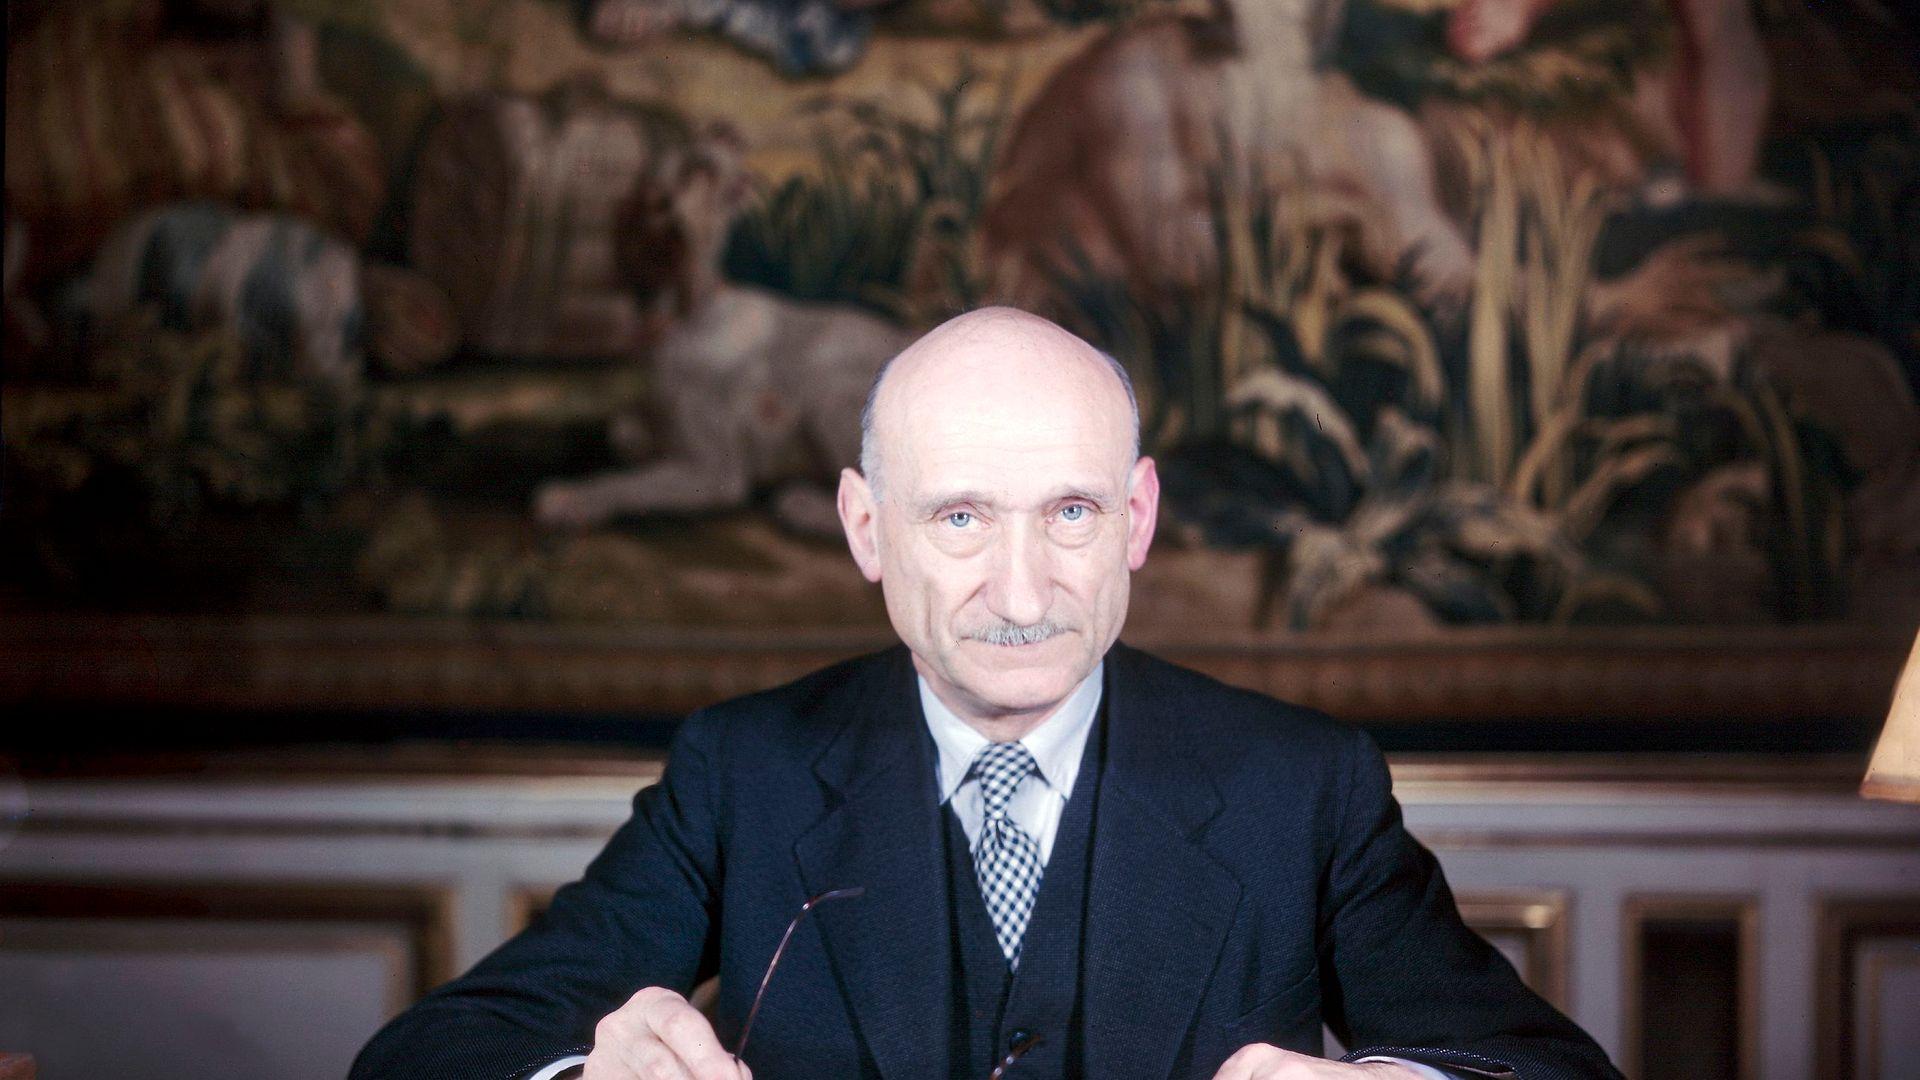 Robert Schuman at his desk in Strasbourg in around 1960 - Credit: Gamma-Keystone via Getty Images